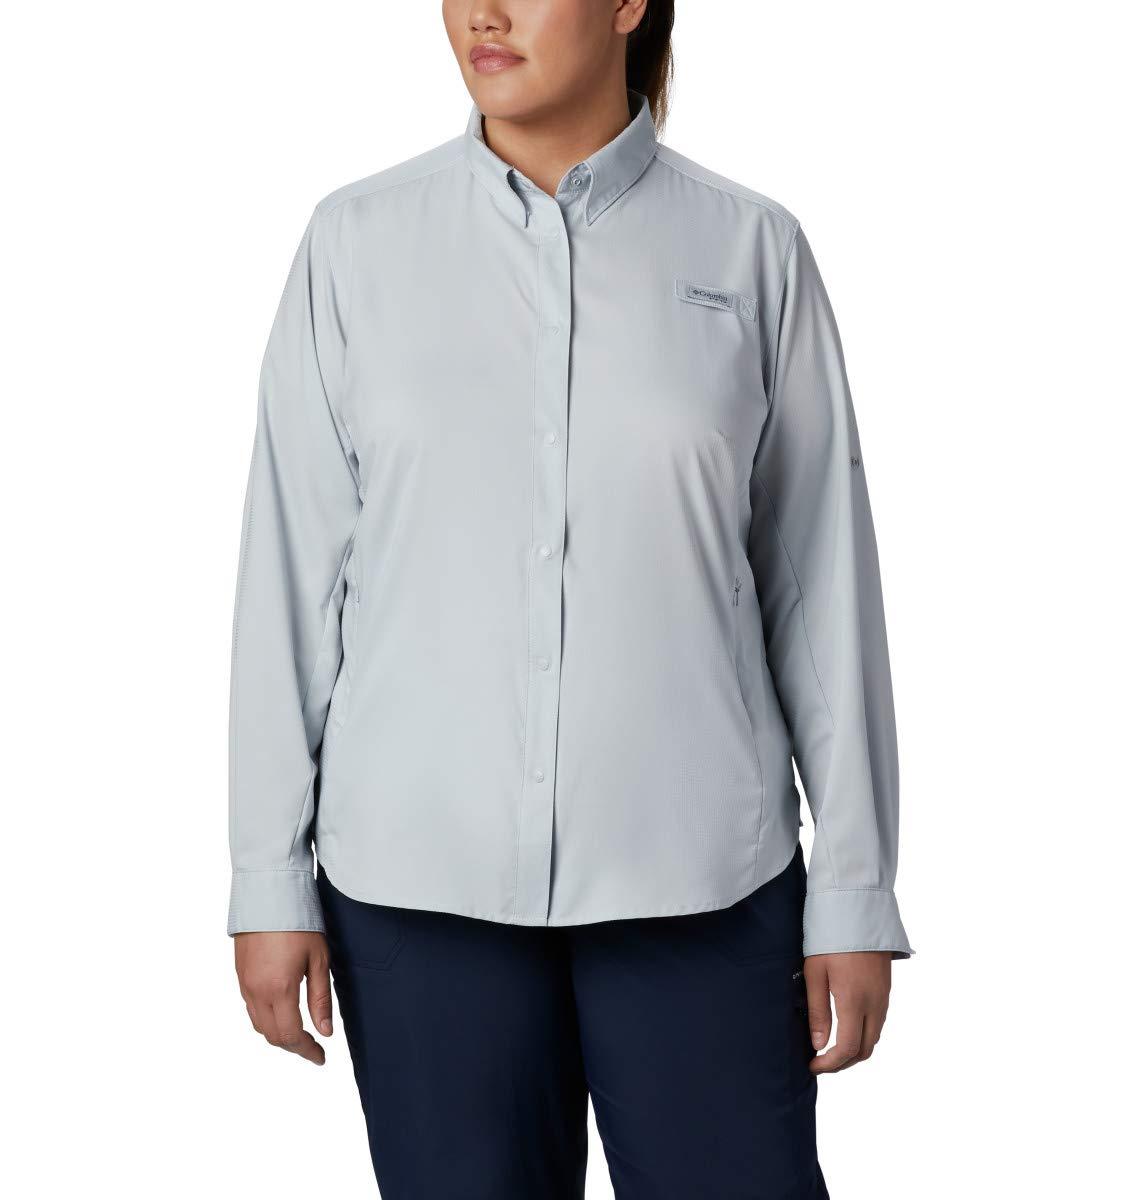 Columbia Women's PFG Tamiami II Long Sleeve Shirt , Cirrus Grey, X-Large by Columbia